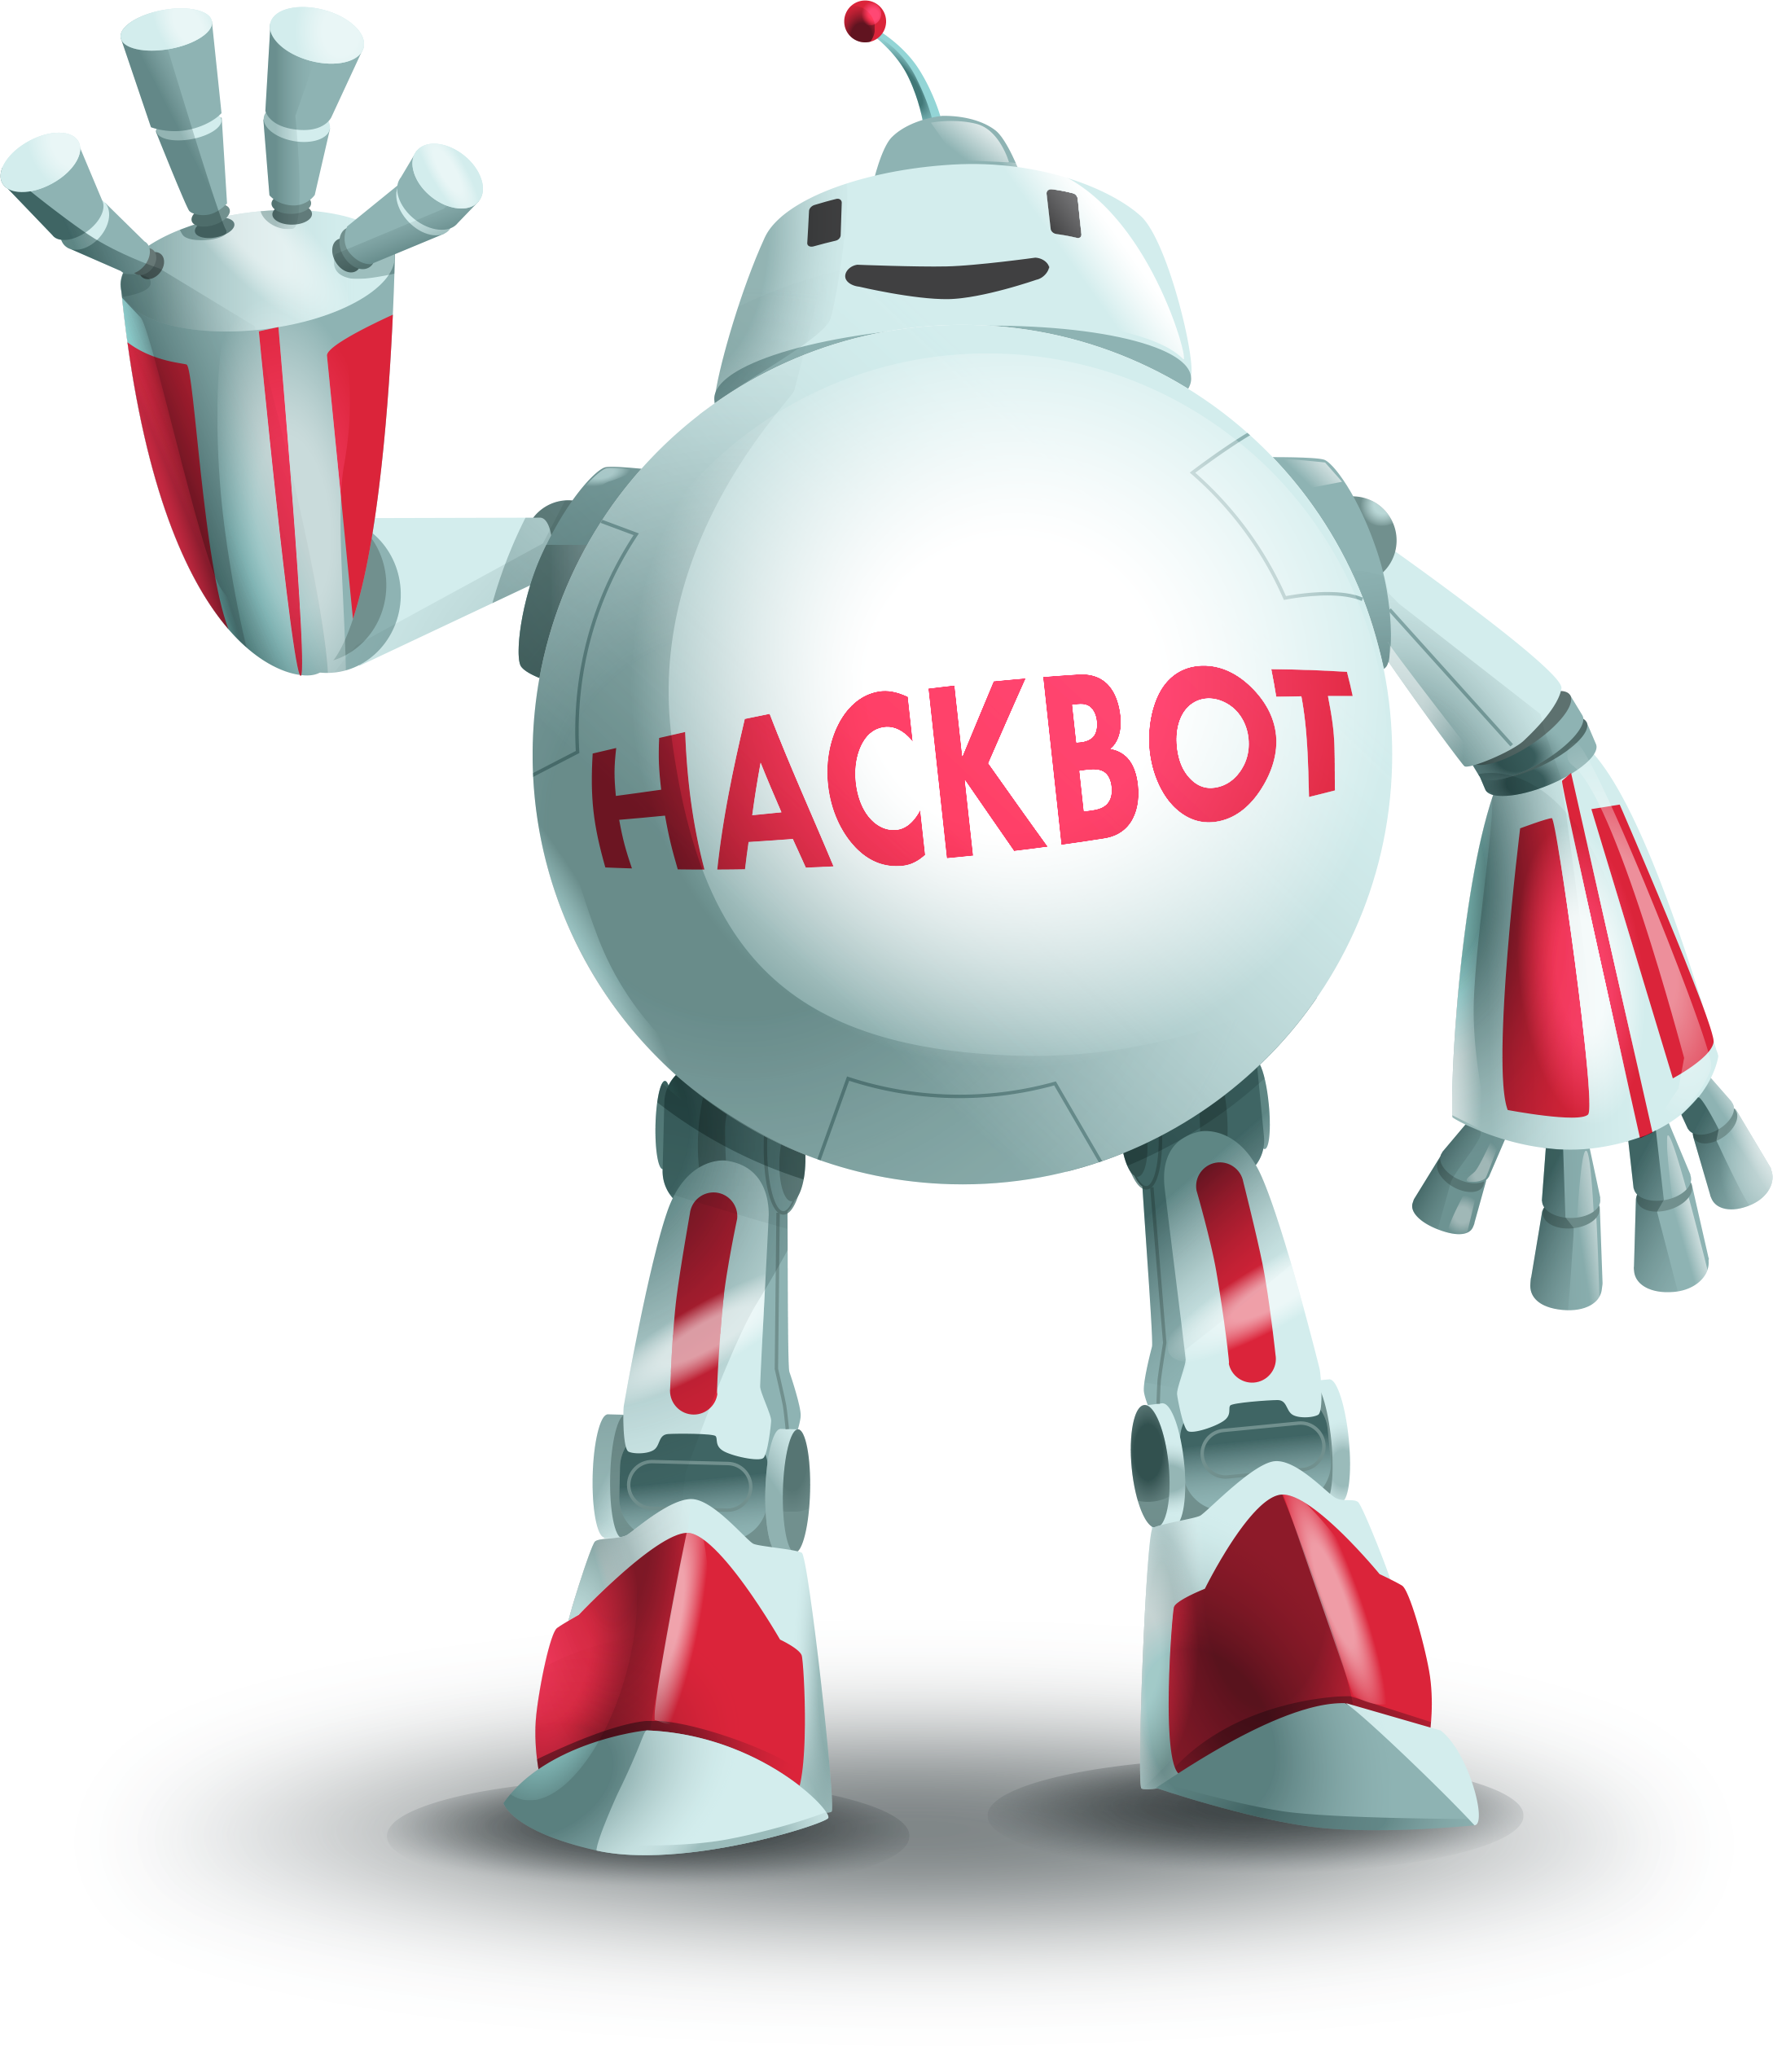 hackbot-blog.png